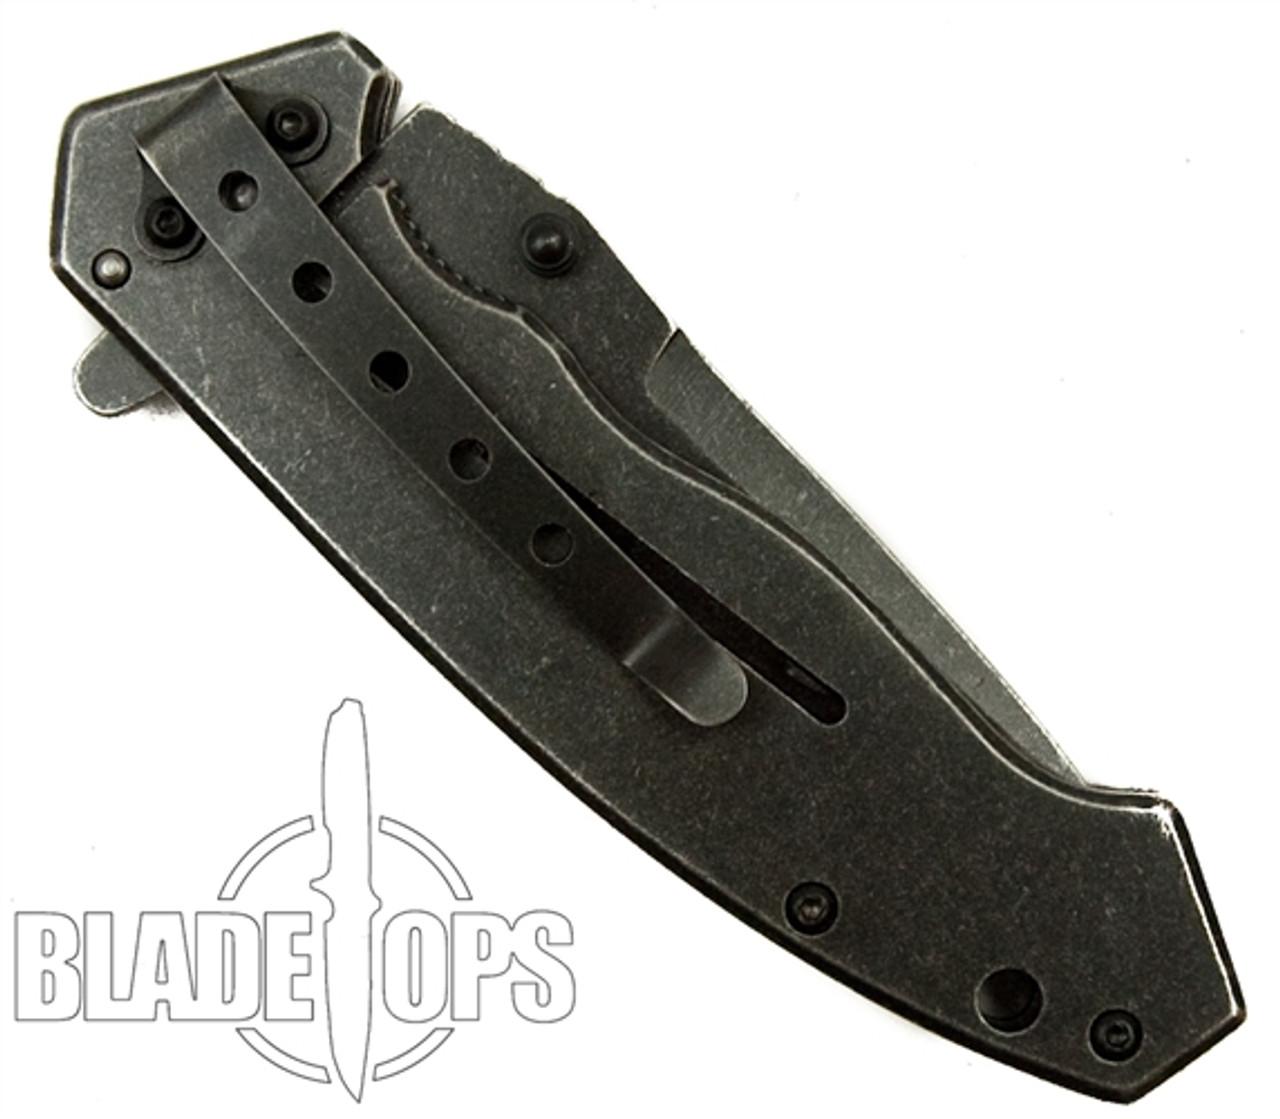 TacForce FrameLock Assist Knife, Black Stonewash Drop Point Blade